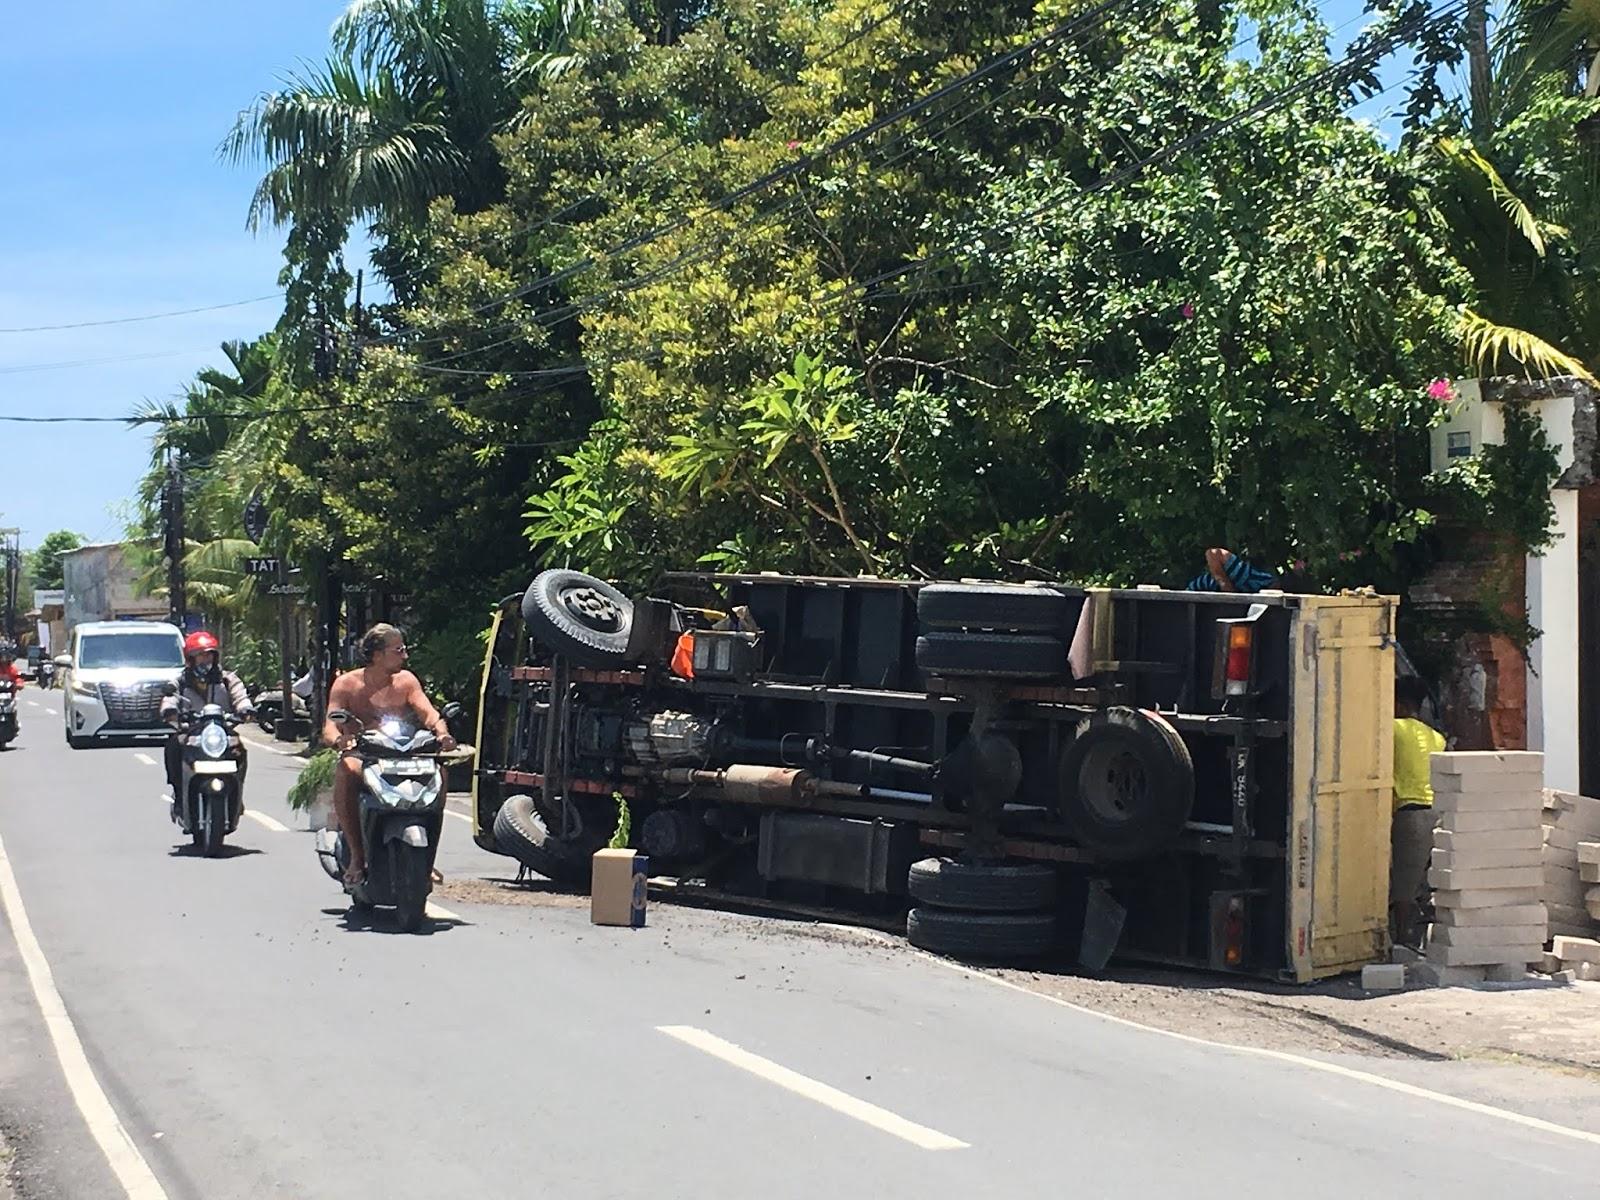 dangereux conduire scooter bali indonesie